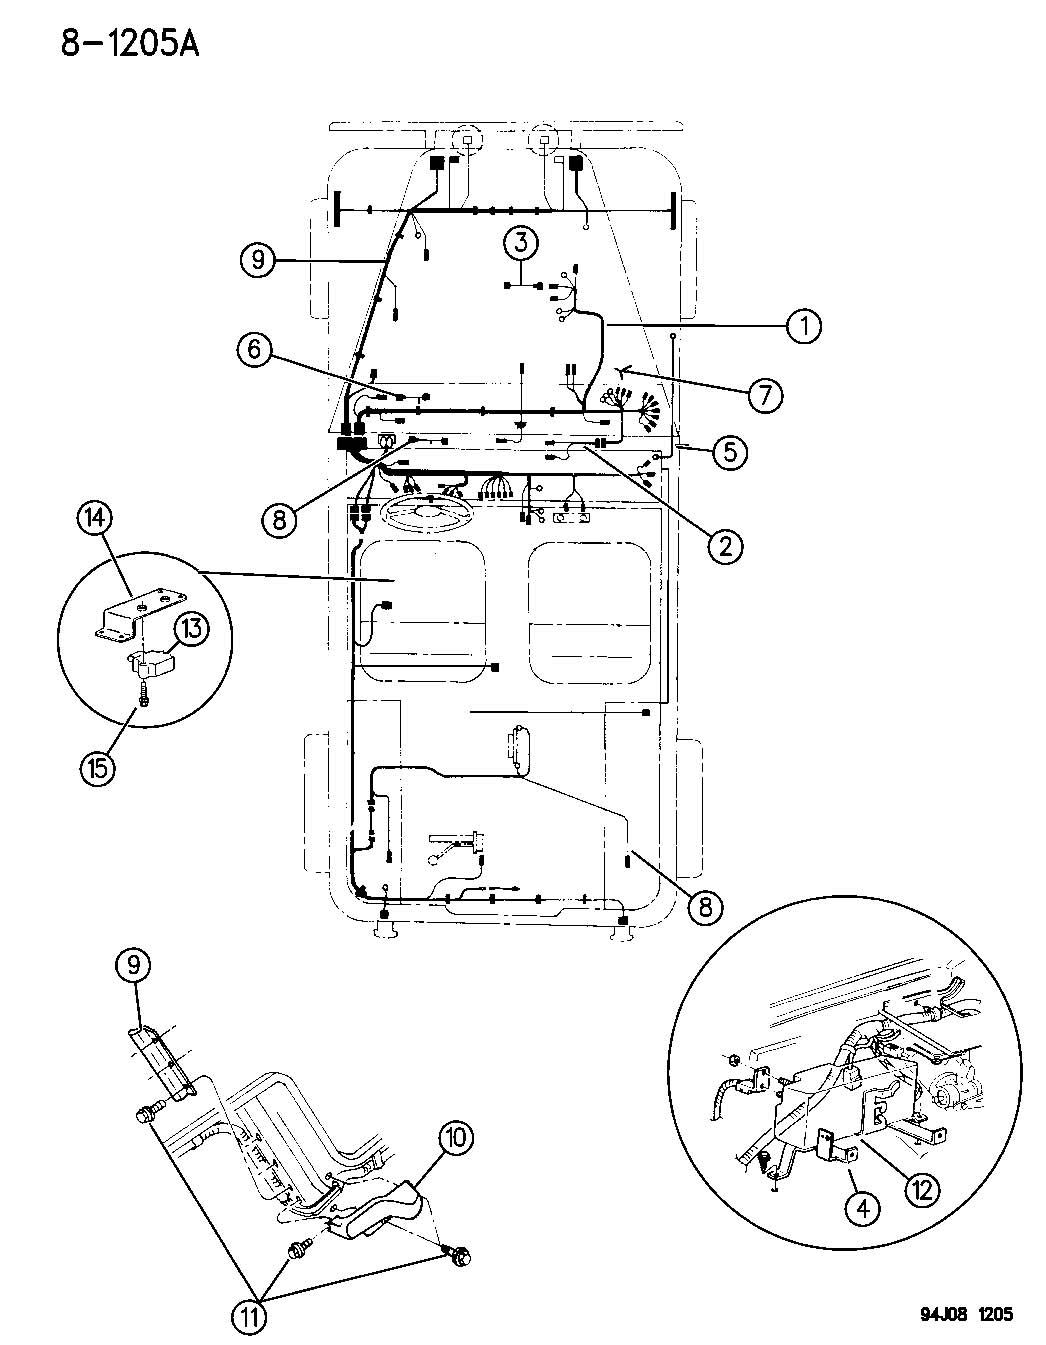 1998 jeep wrangler tj wiring diagram 2010 engine free image